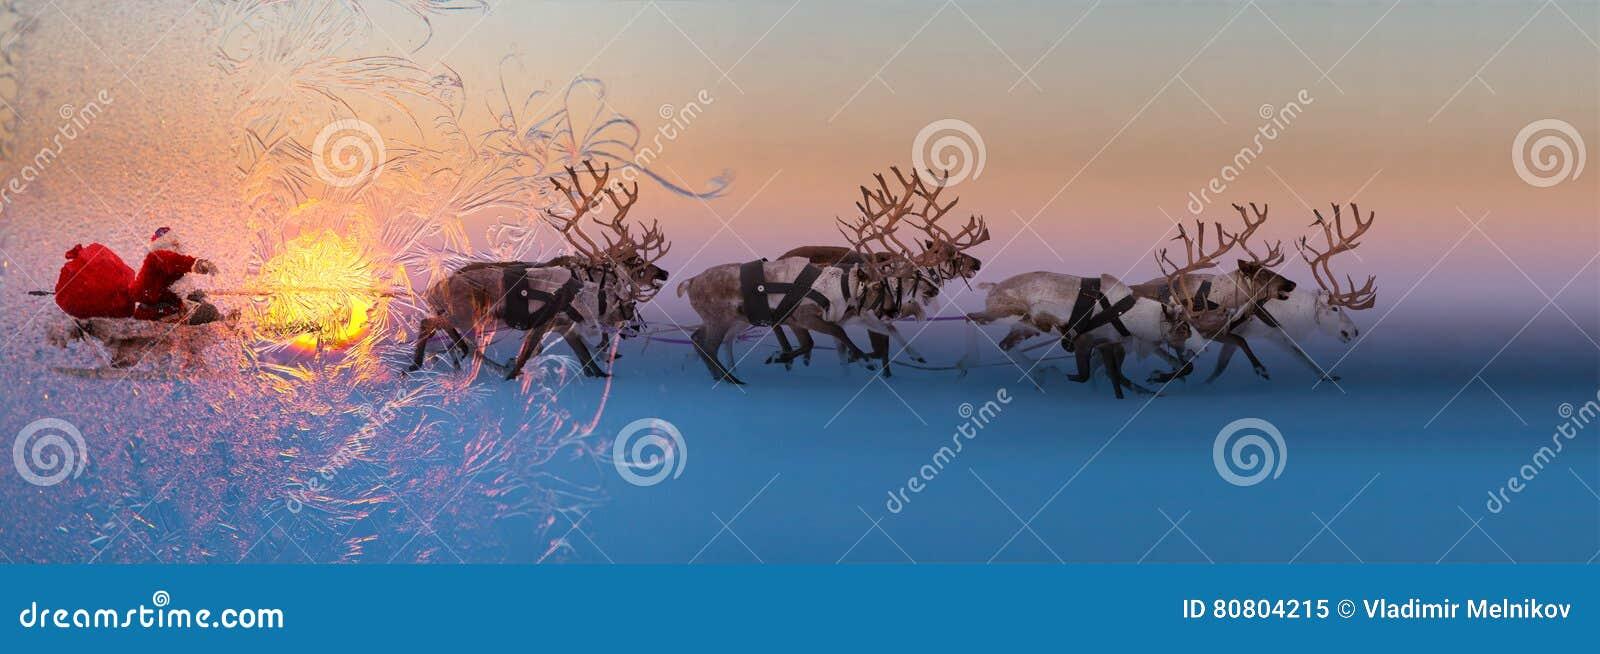 Download Санта Клаус сидит в санях оленей Стоковое Изображение - изображение насчитывающей олени, тележка: 80804215